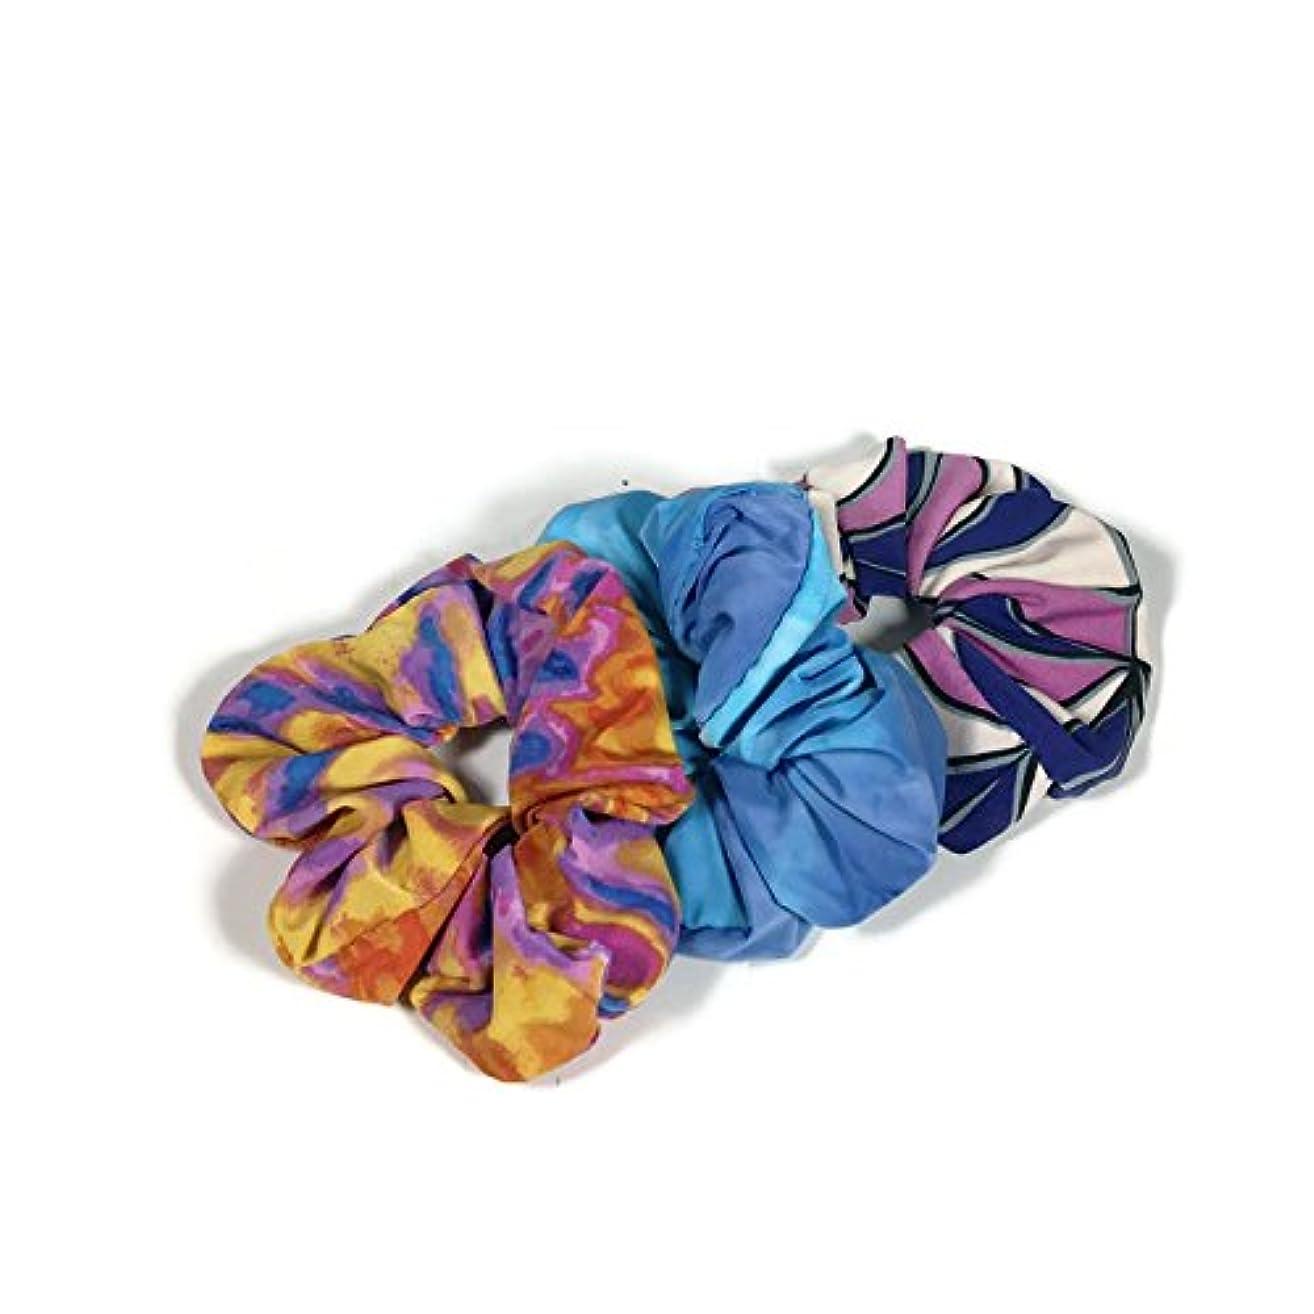 Set/3 Lycra Scrunchies Spandex Scrunchies Pink Blue White Yellow Hair Ties Athletic Hair Ties Swim Scrunchies Retro Scrunchies